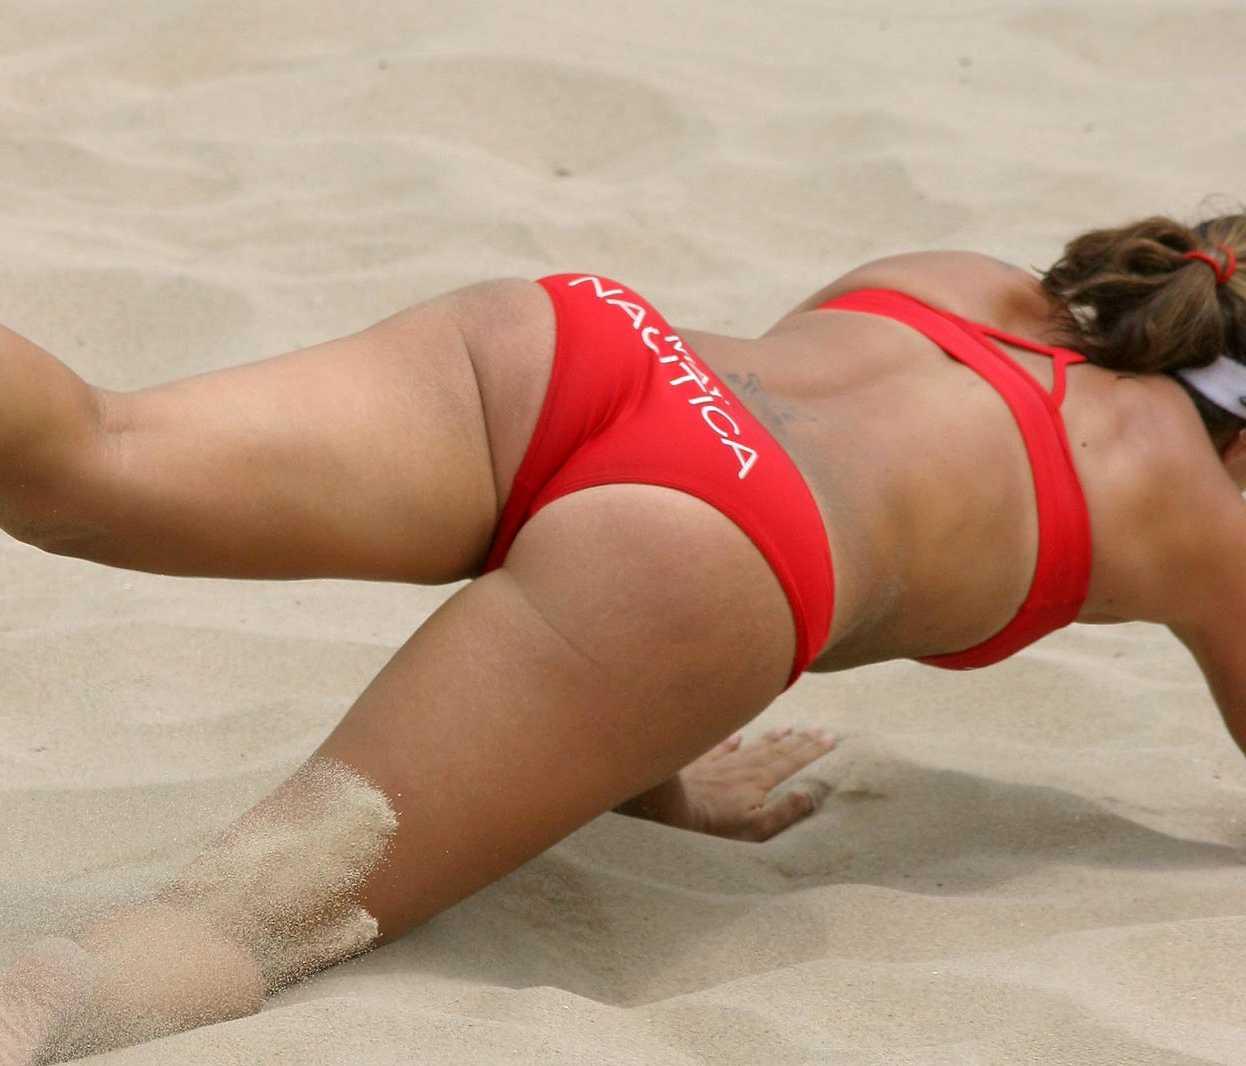 Beach volleyball misty may butt